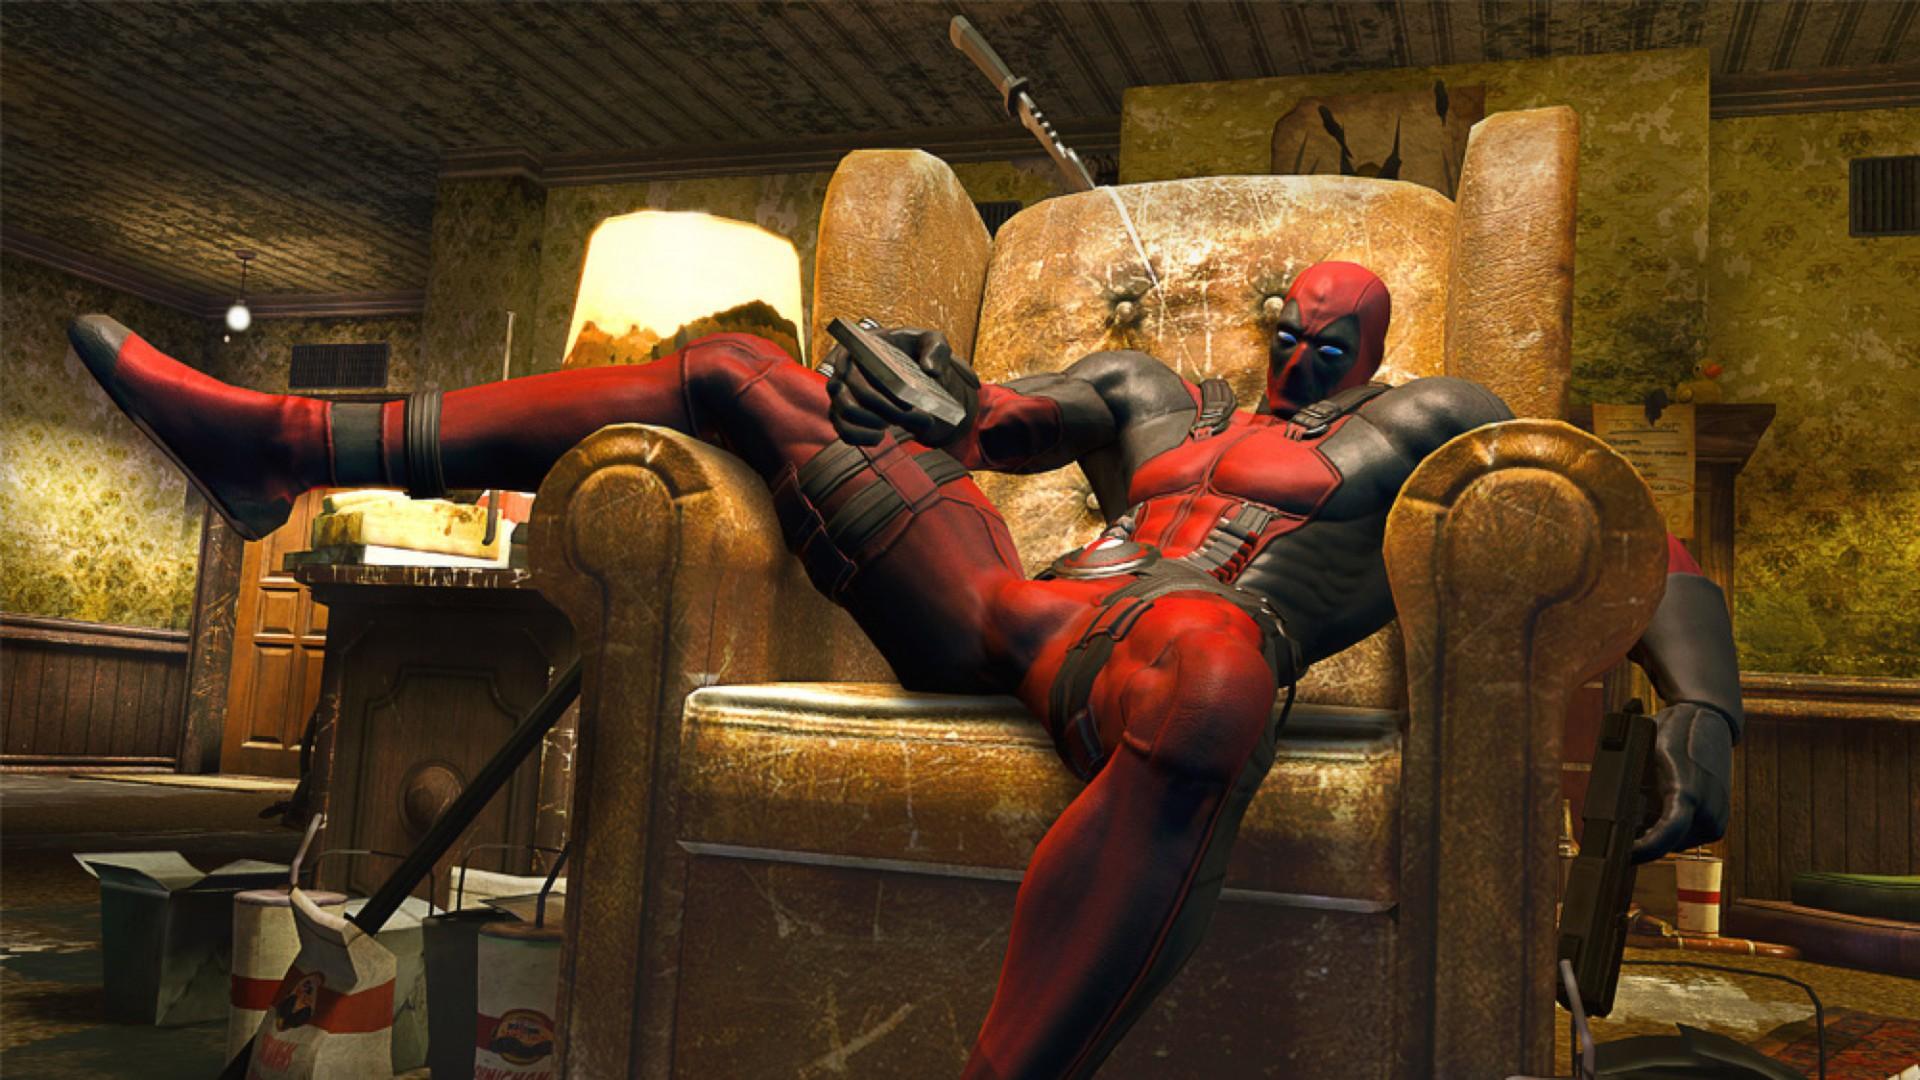 Deadpool Is Available For Sale Once Again VG247